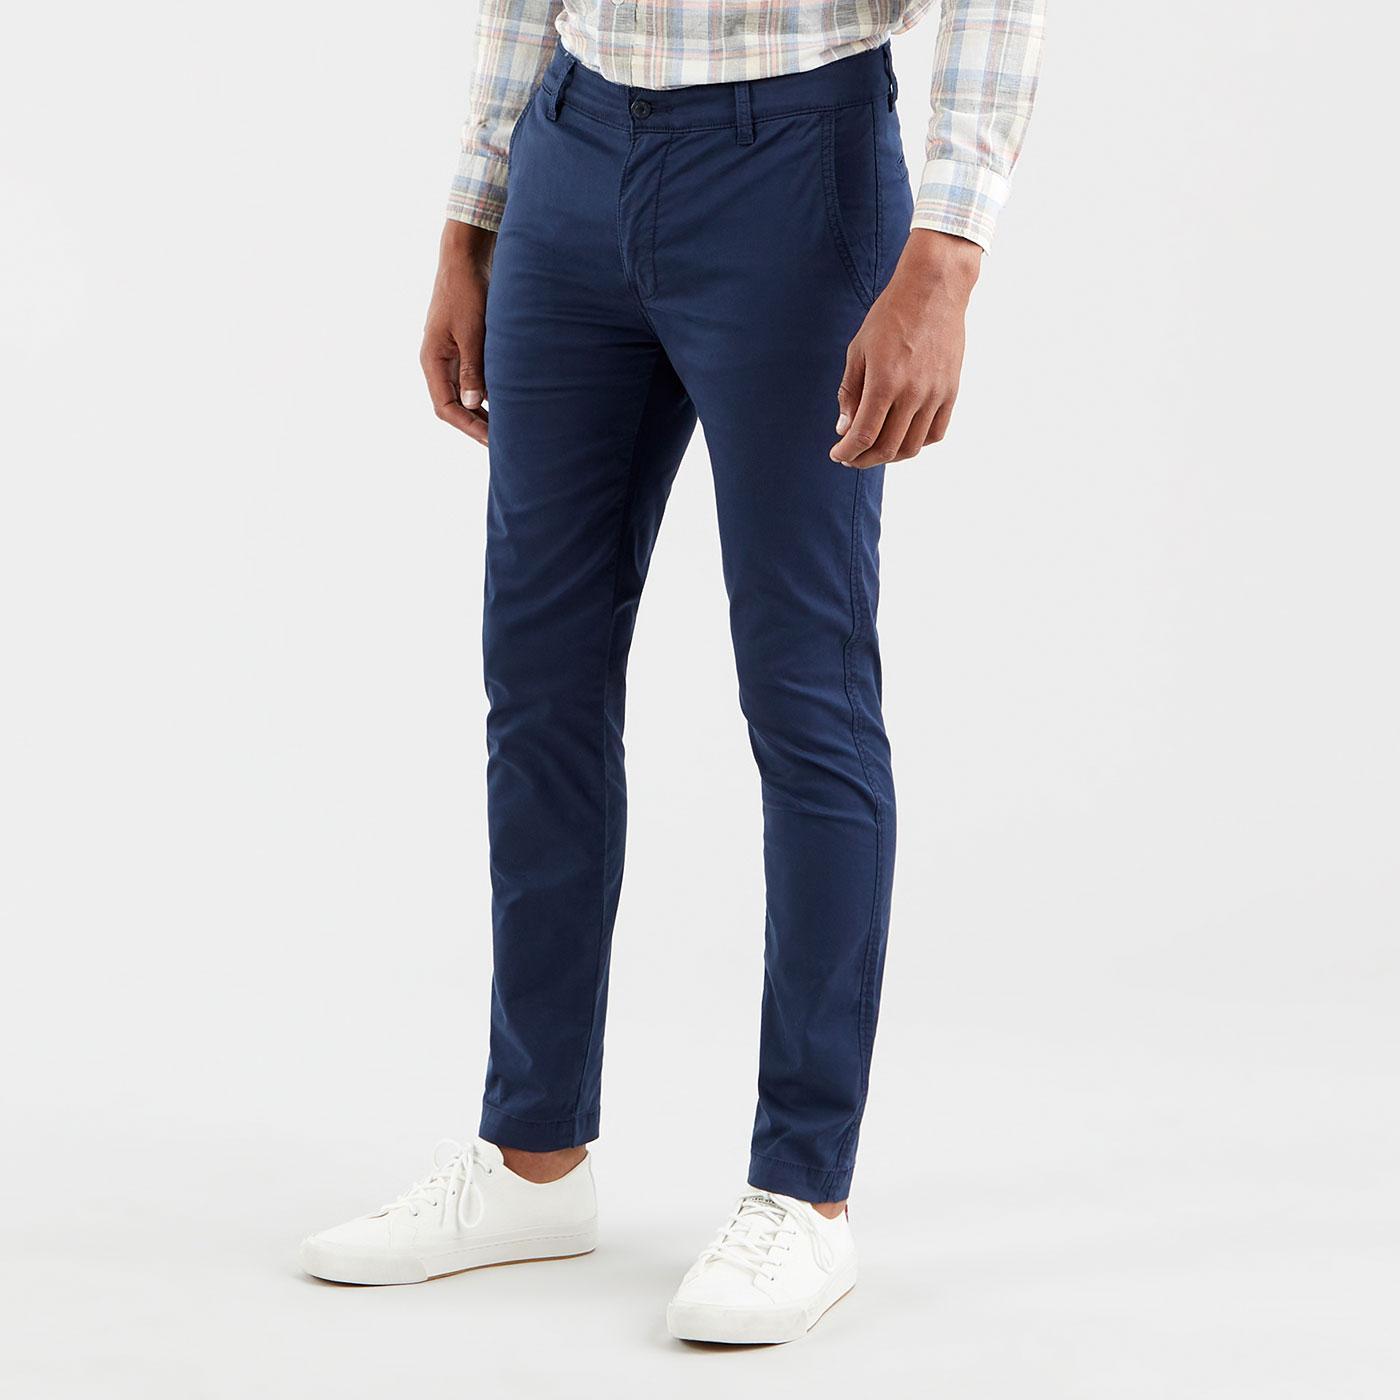 LEVI'S XX Chino Slim Taper Twill Trousers (Navy)